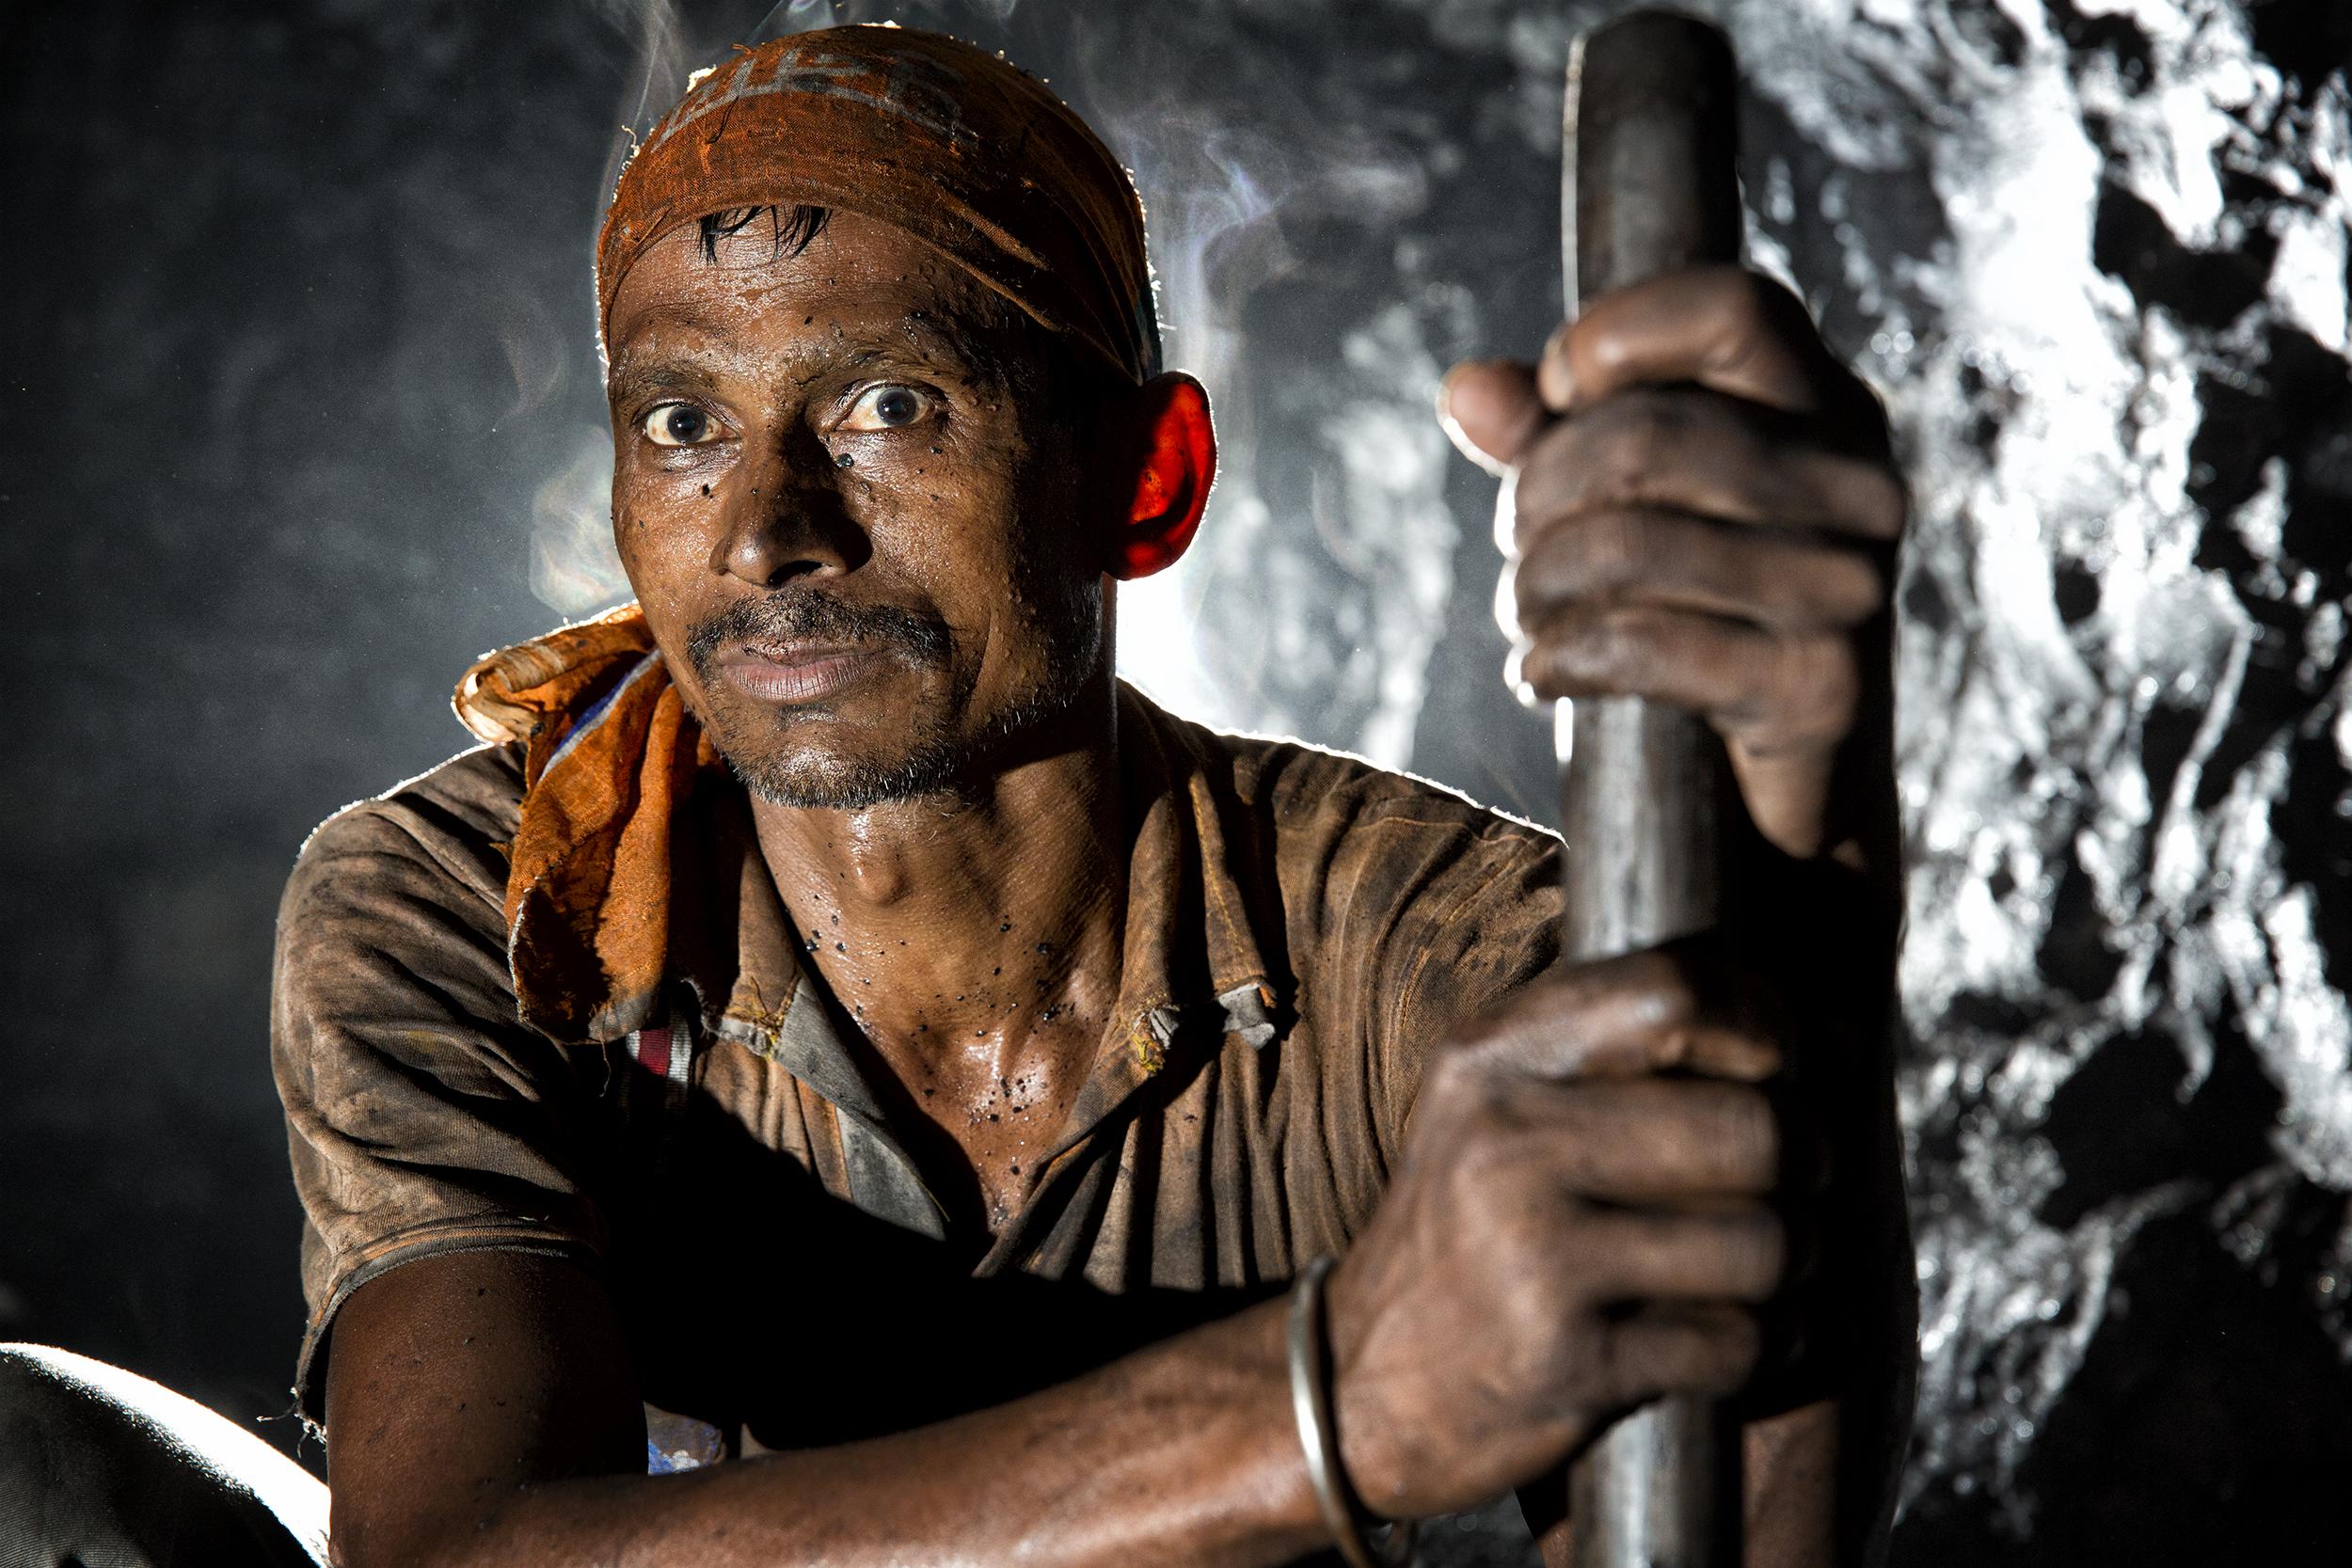 Underground Coal Miner, Eastern India, 2013